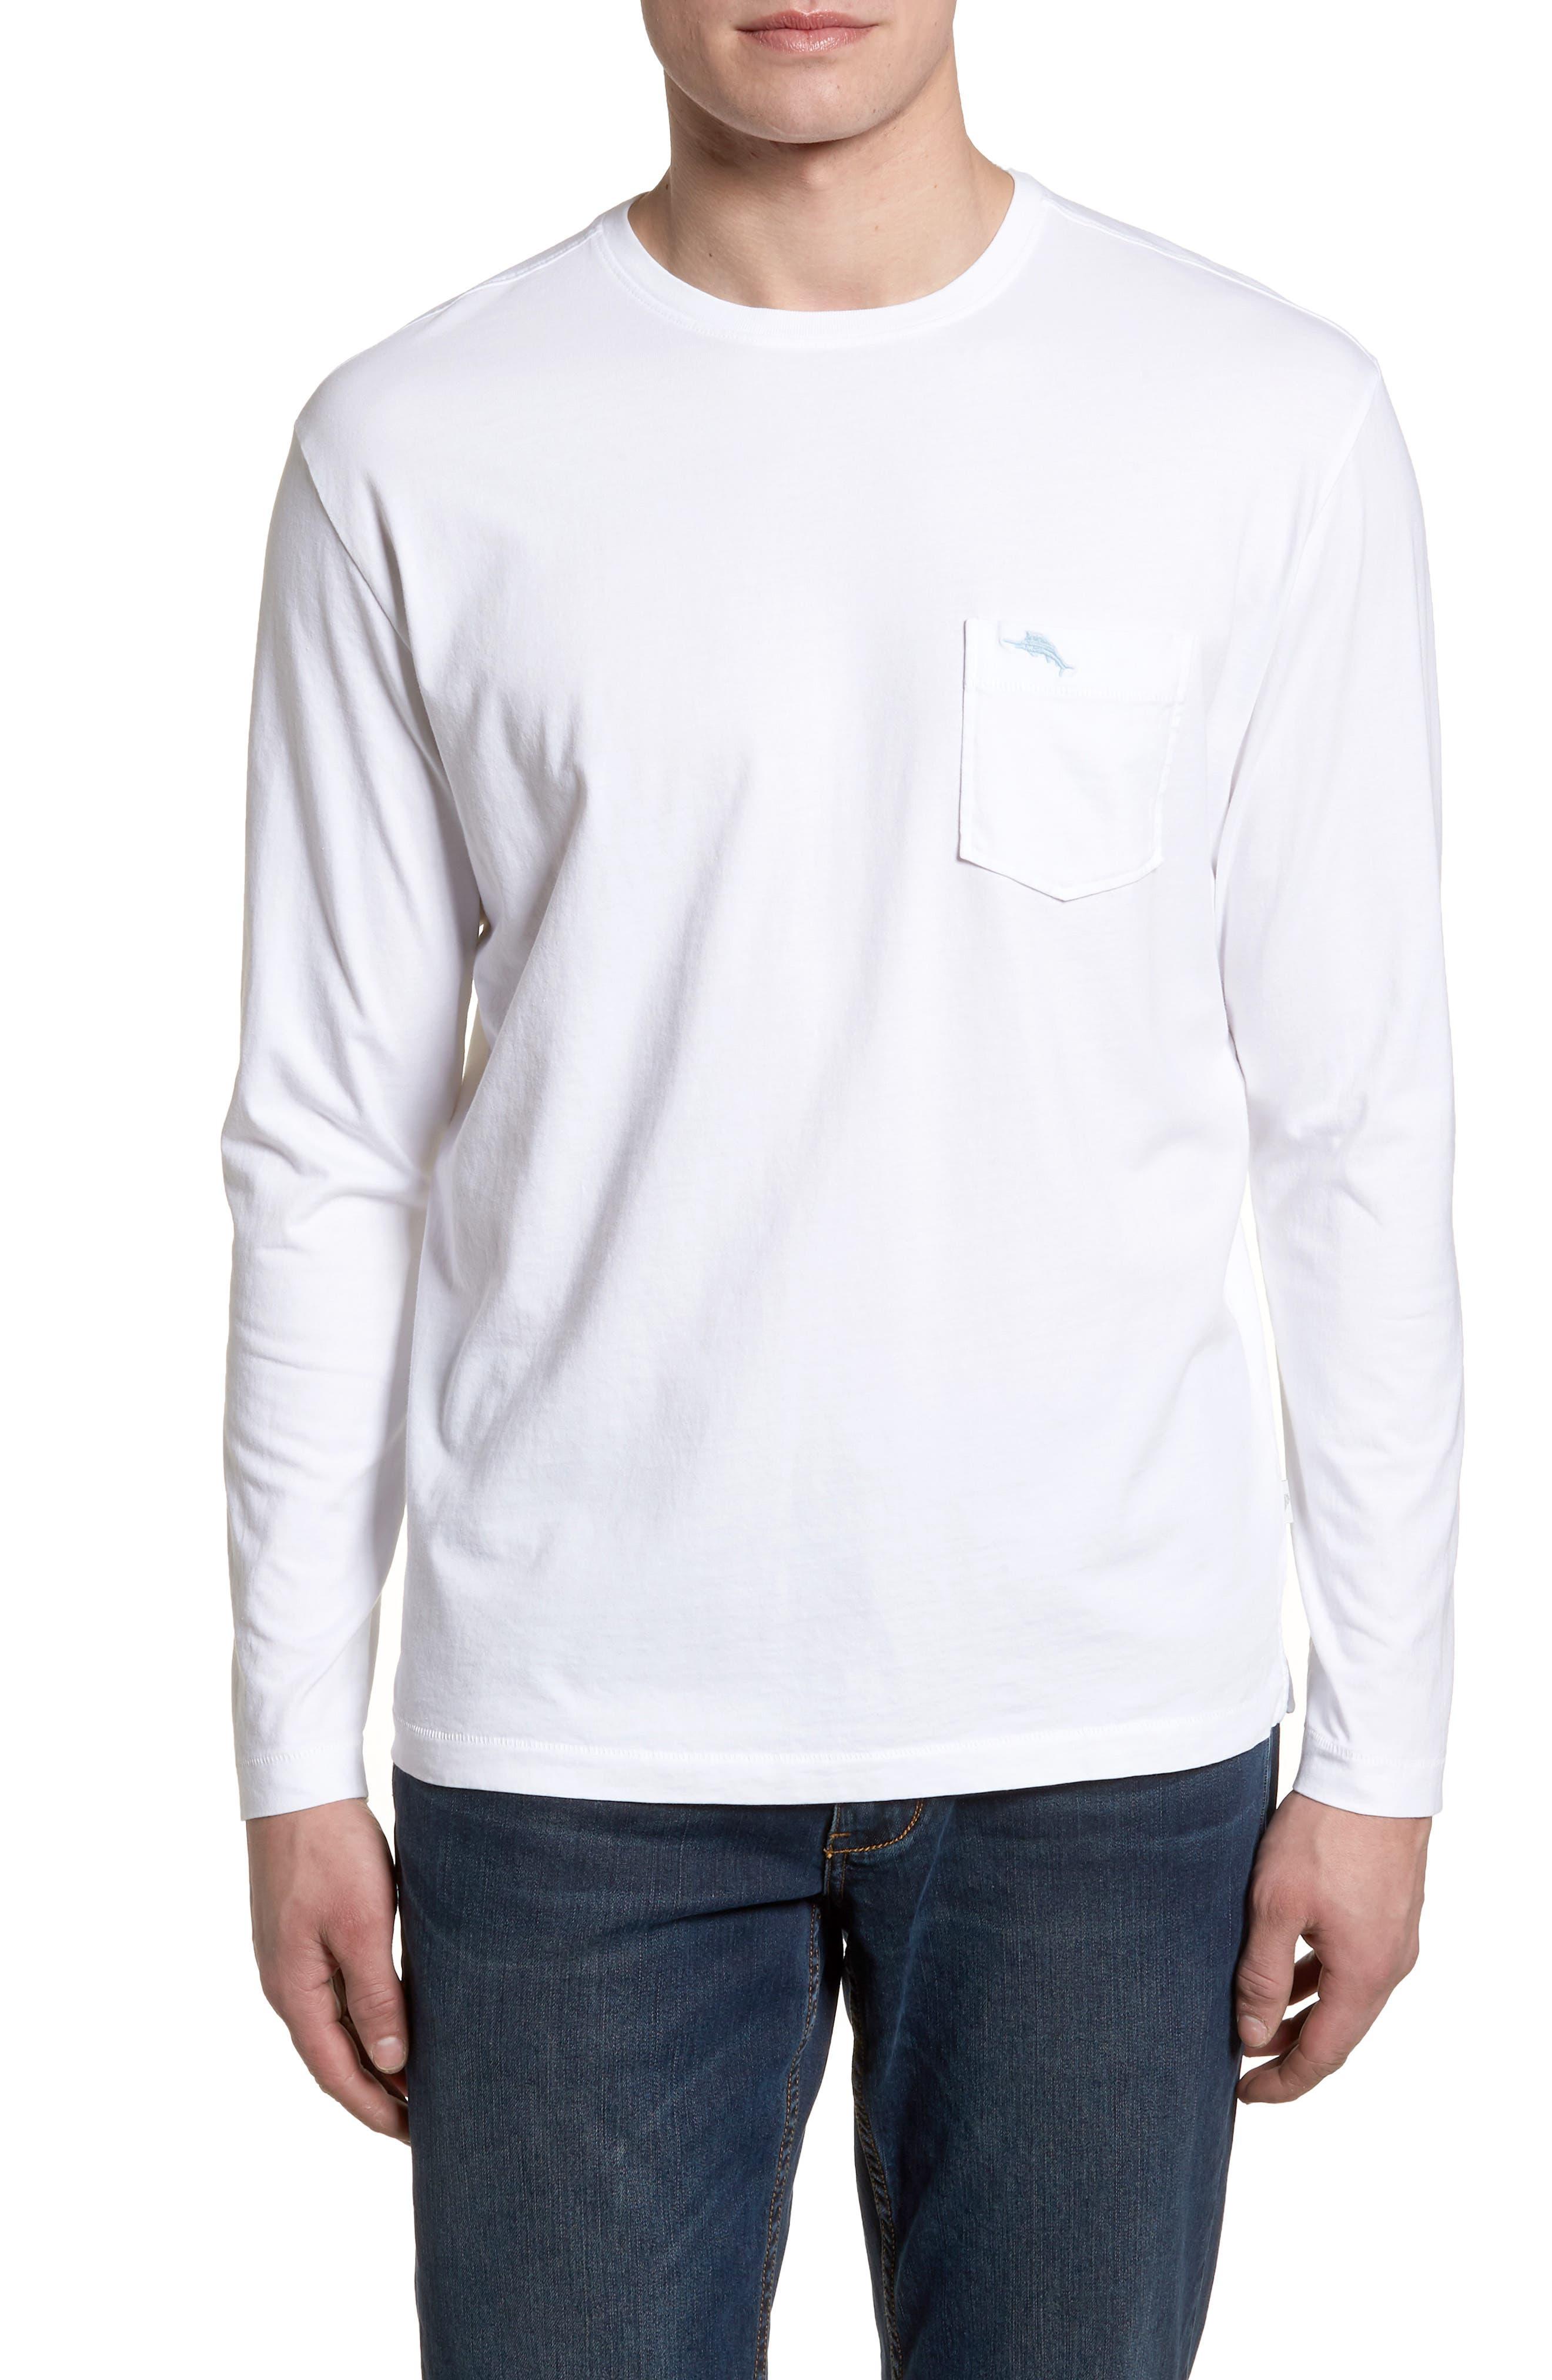 New Bali Skyline T-Shirt,                             Main thumbnail 1, color,                             White